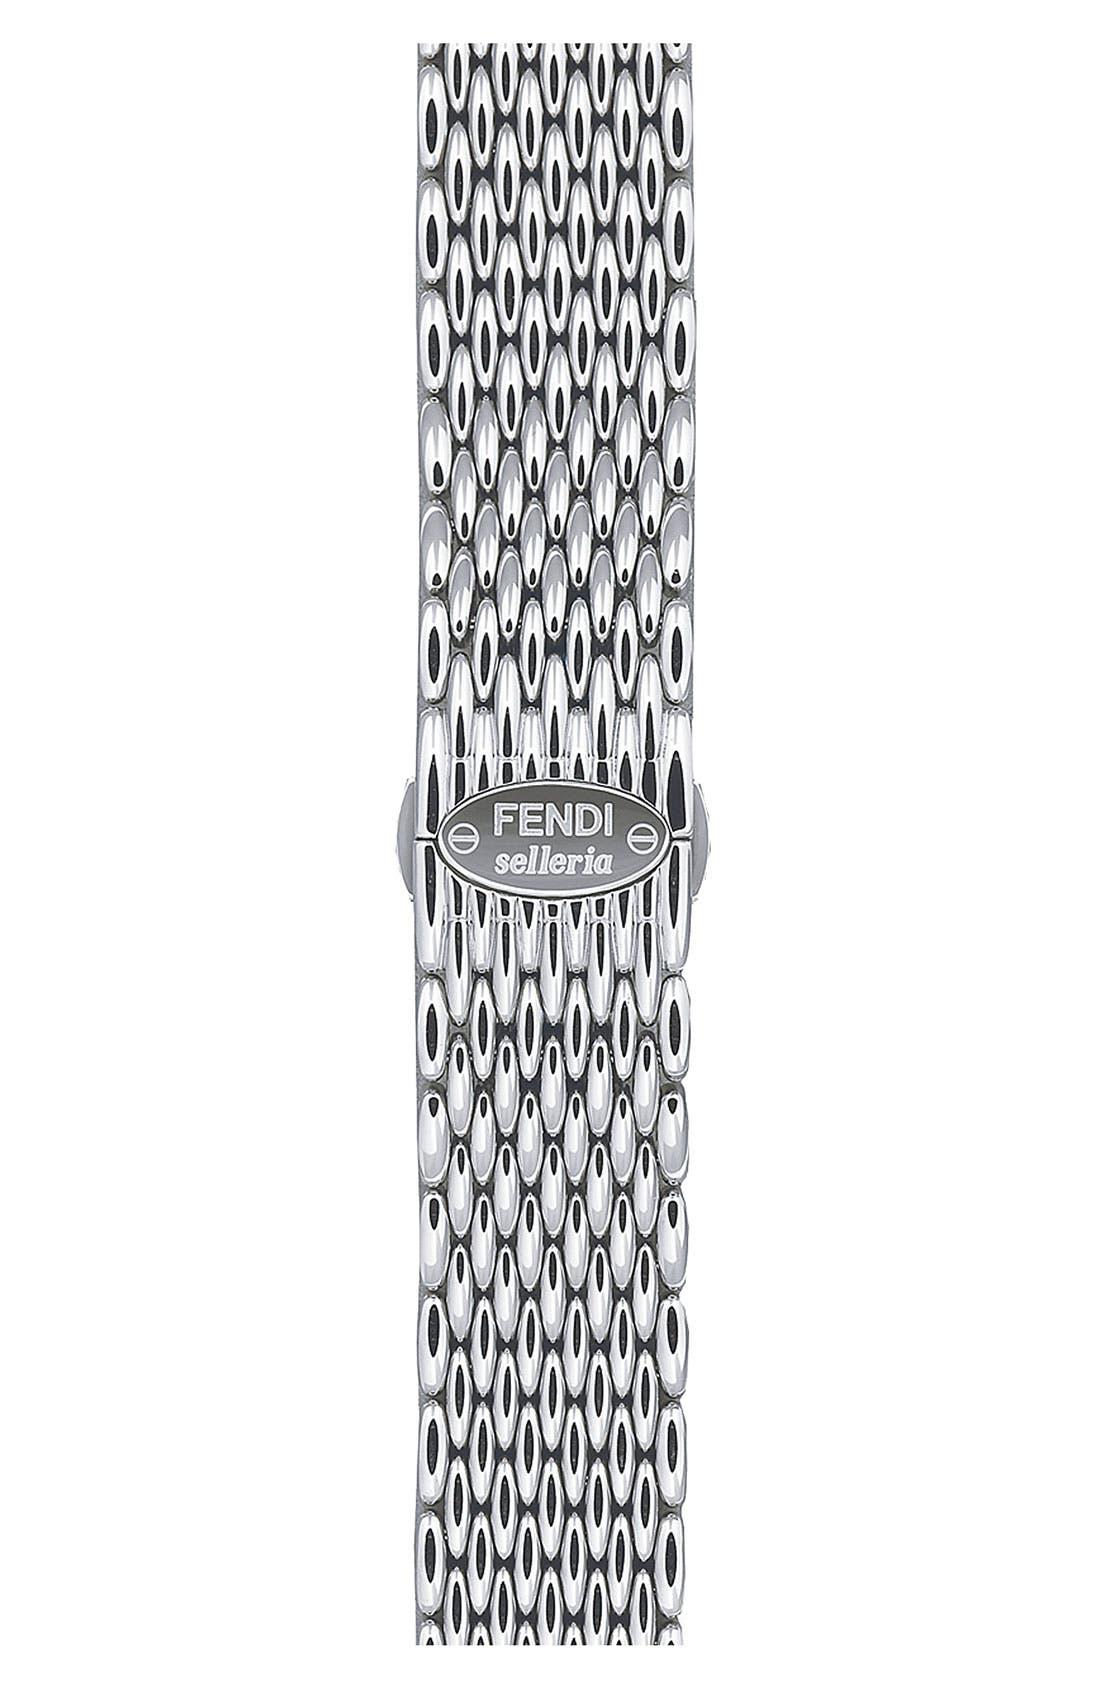 Alternate Image 1 Selected - Fendi 'Selleria' 18mm Stainless Steel Bracelet Watchband